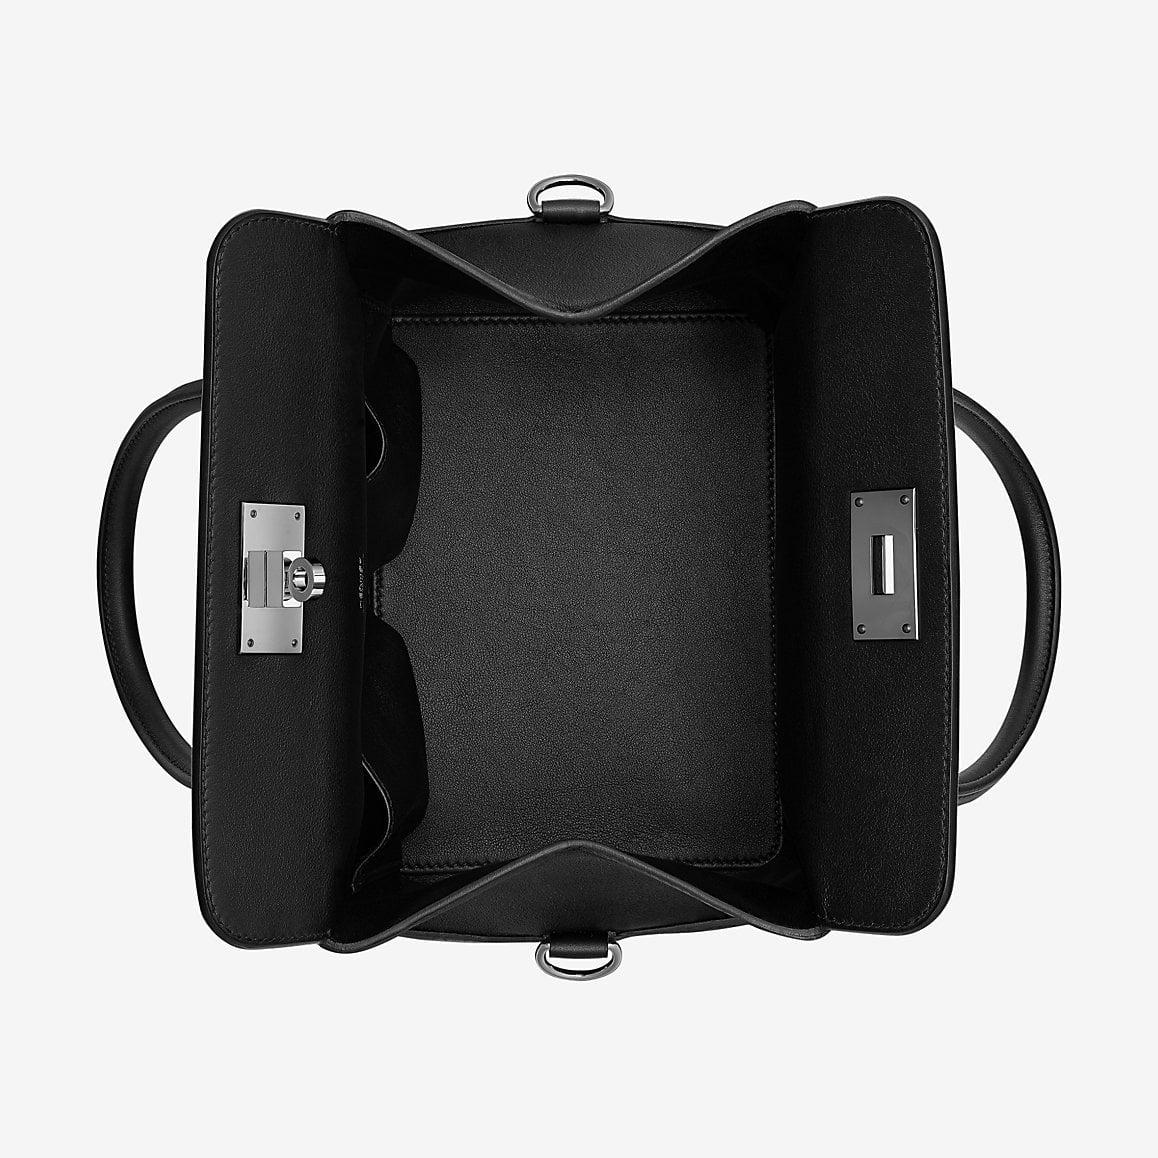 toolbox-20-bag--062206CK89-above-4-300-0-1158-1158